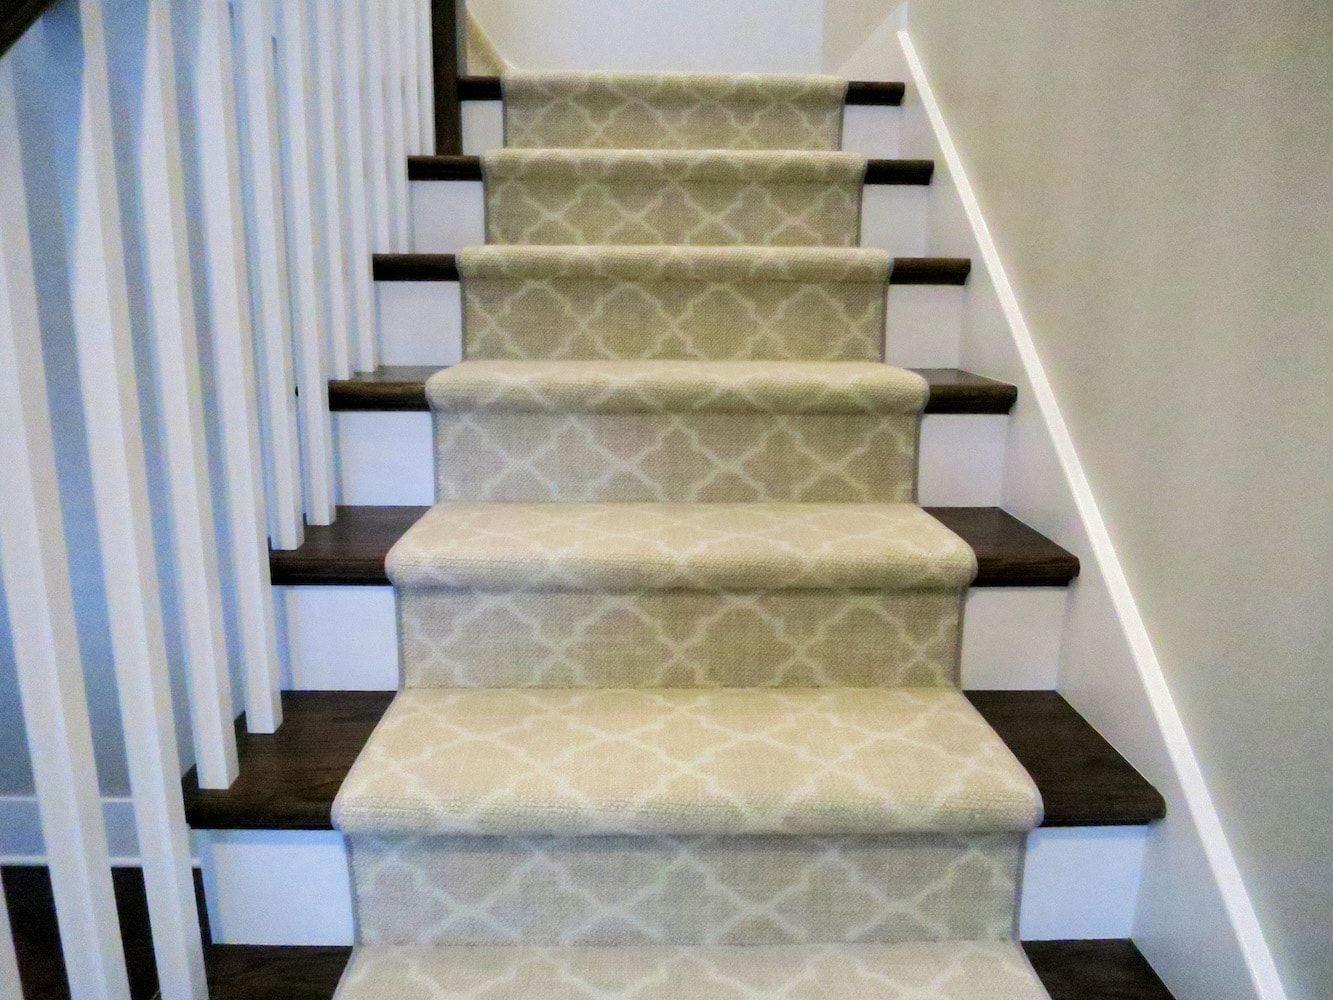 Chicago Area Stair Runner Design Installation Custom Fabrication Kashian Bros Carpet And Floori Stair Runner Stair Runner Installation Stair Runner Carpet